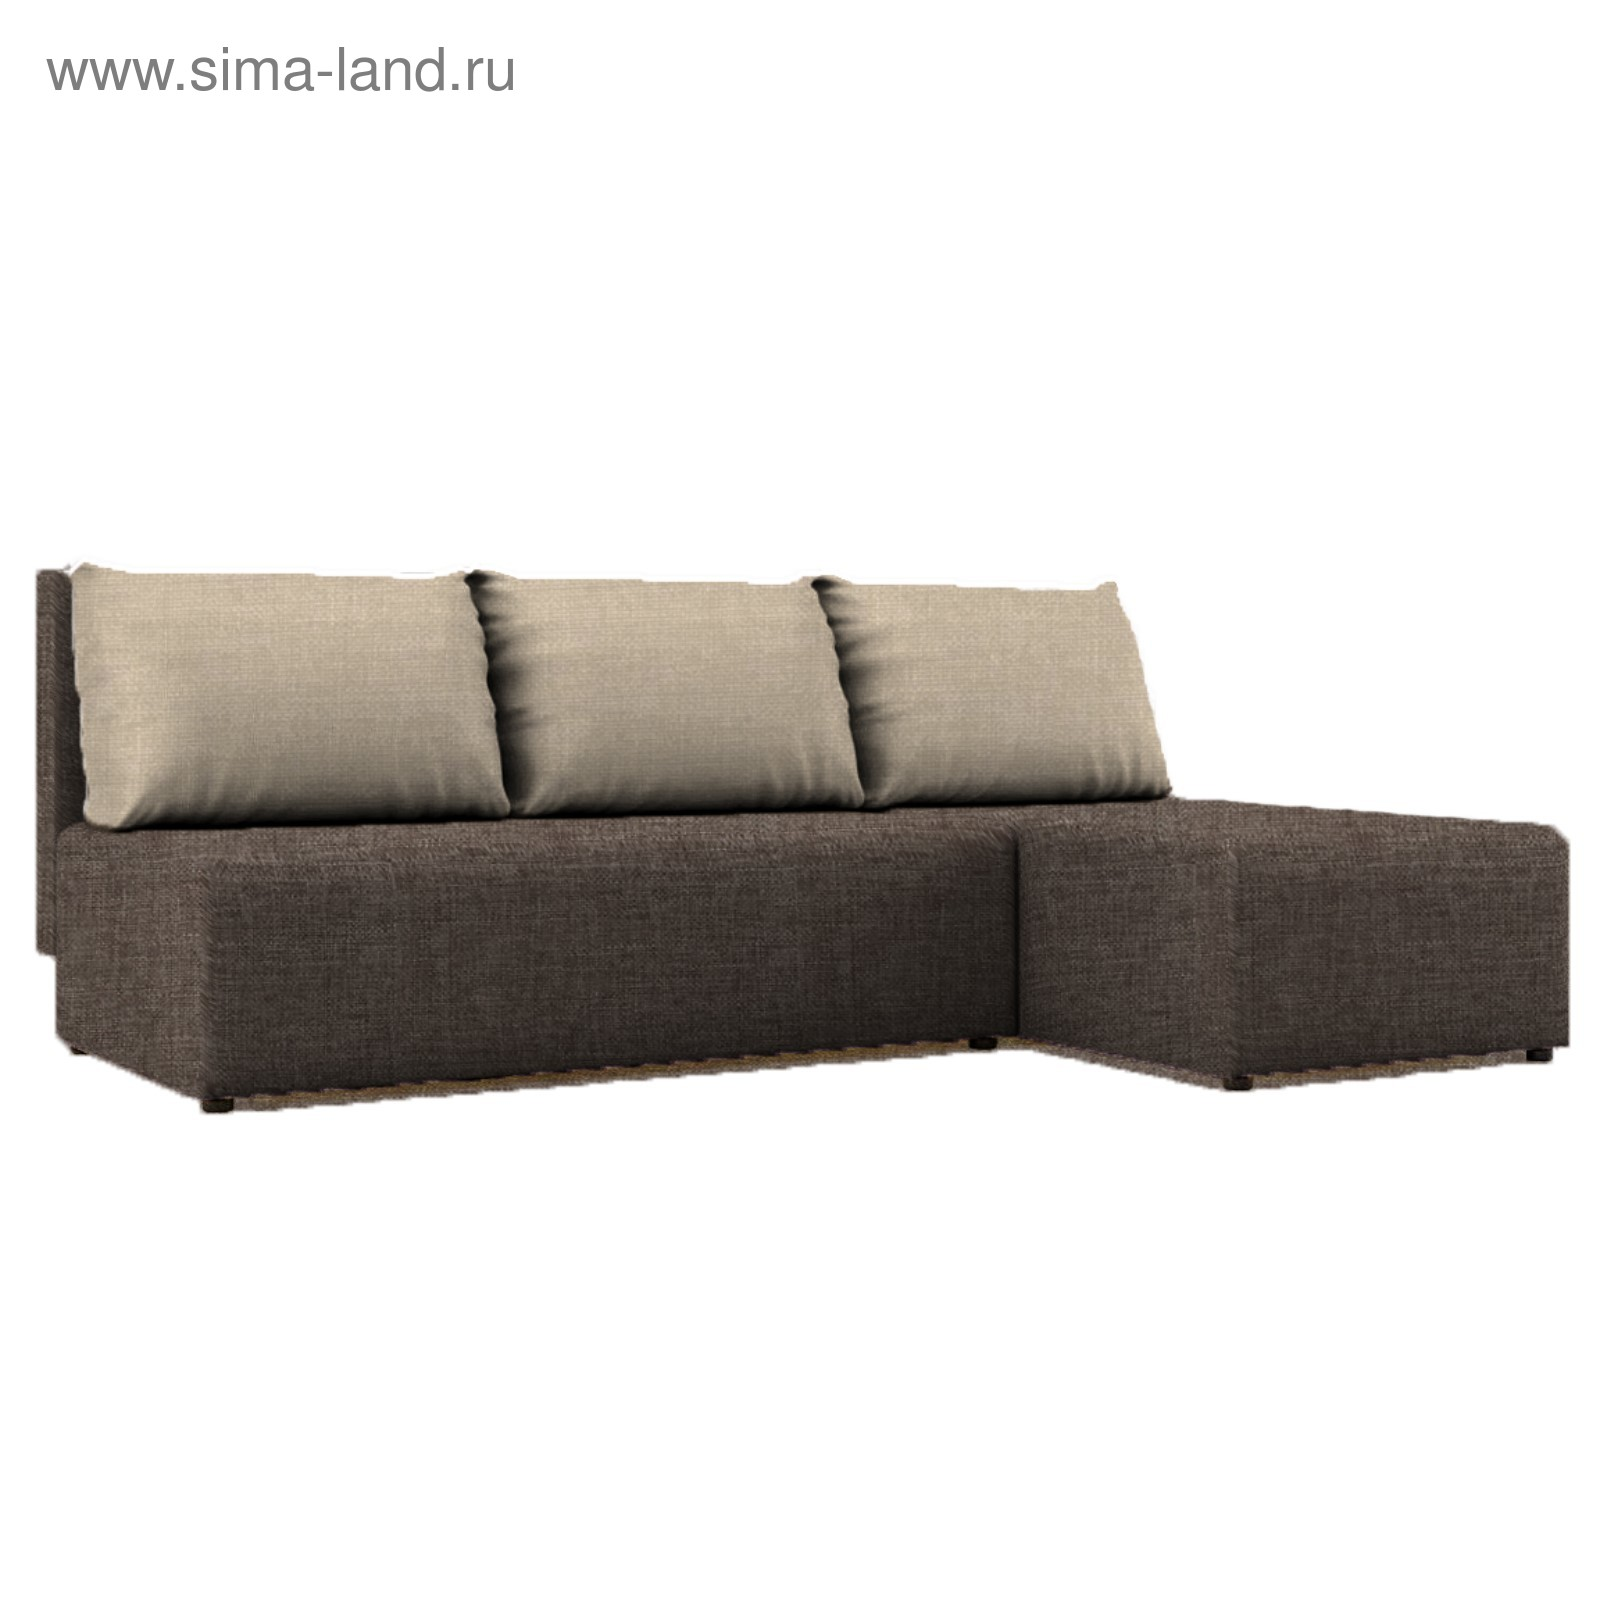 угловой диван алиса механизм еврокнижка обивка савана хайзел